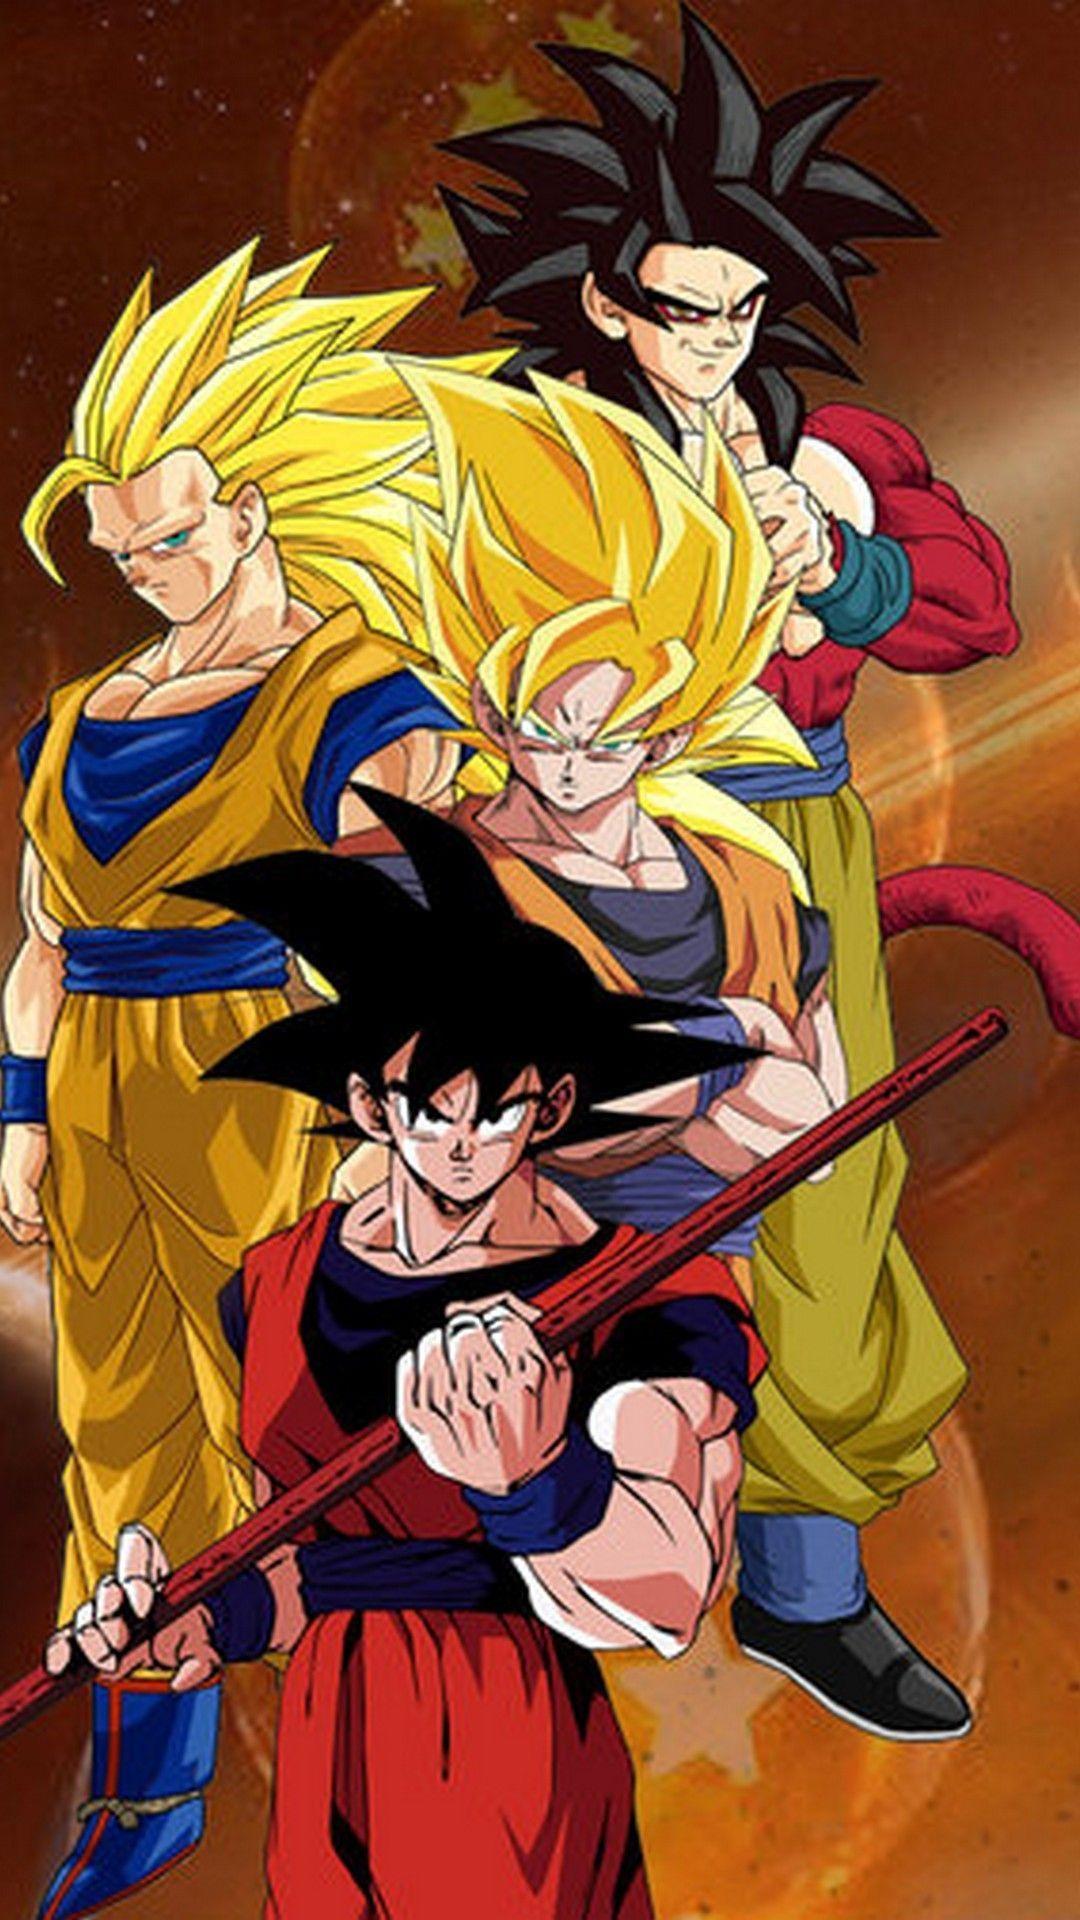 Goku Super Saiyan 4 Wallpapers Top Free Goku Super Saiyan